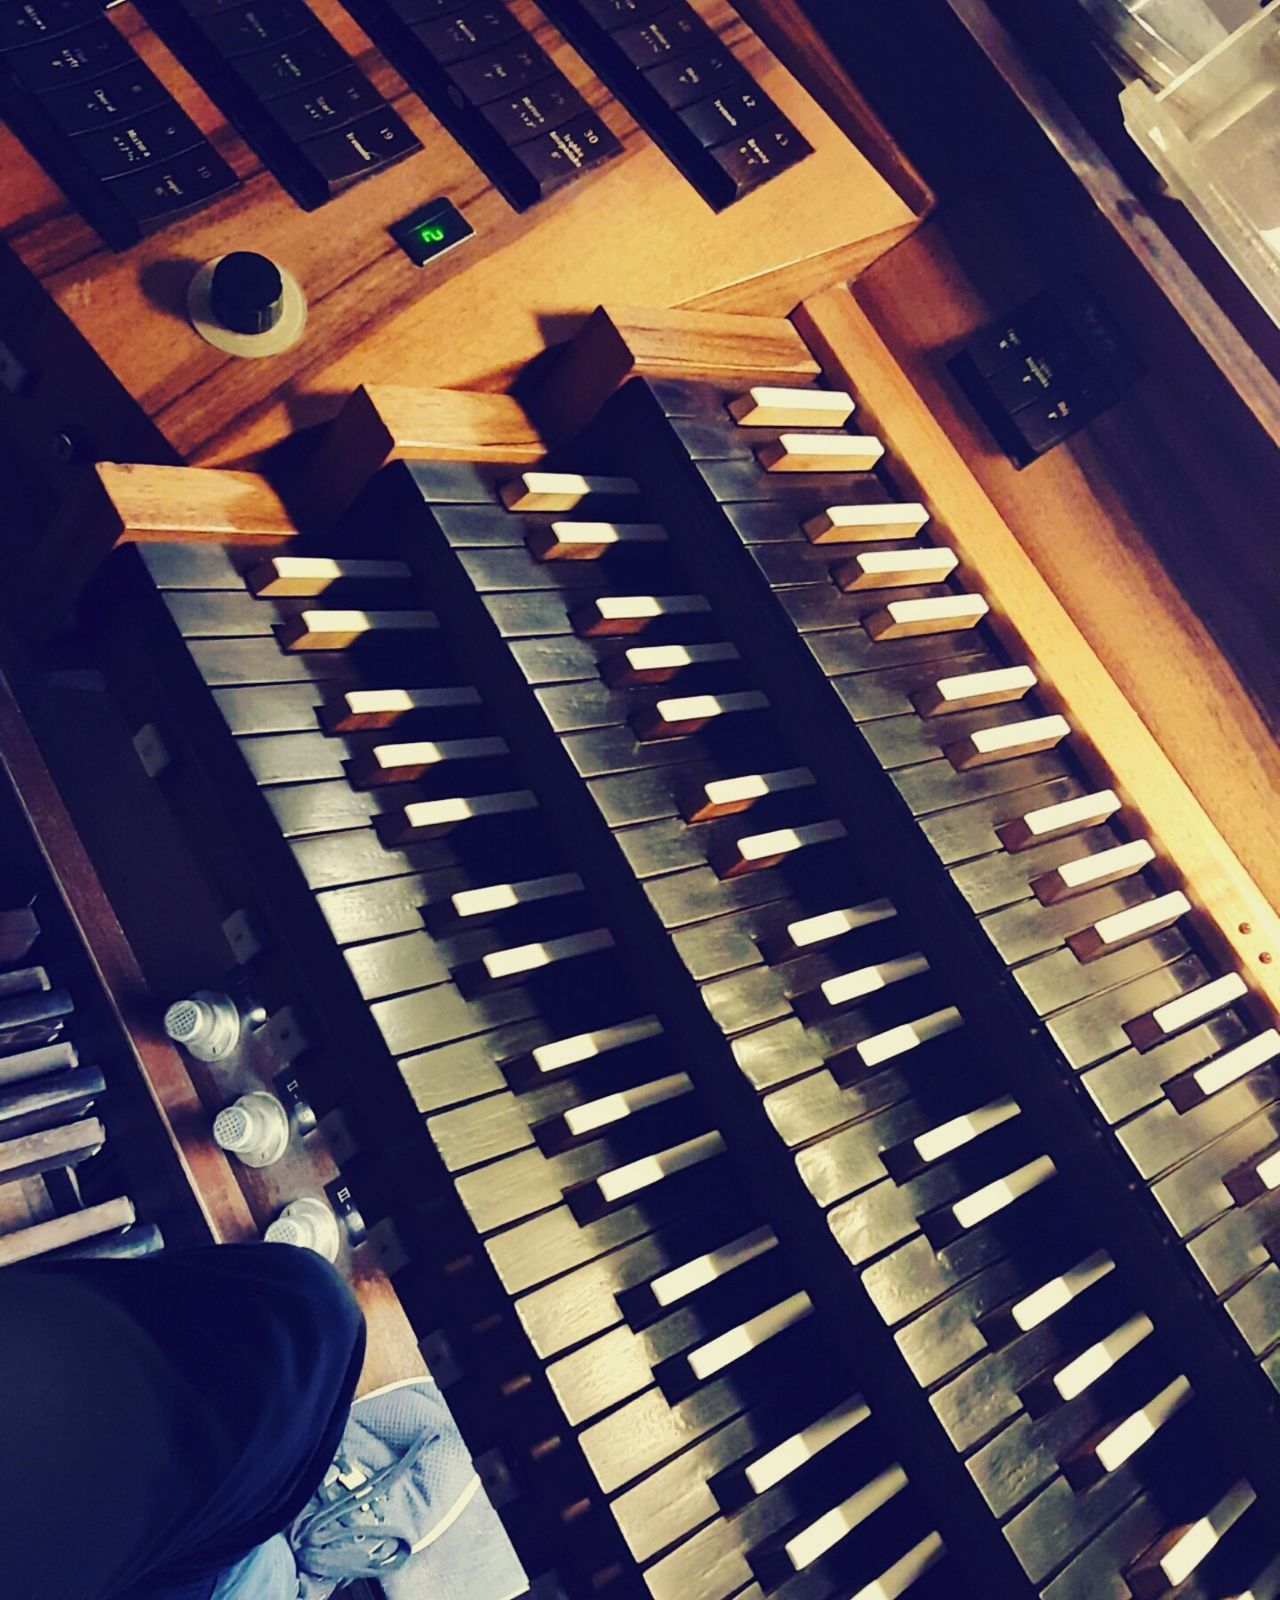 Pipe Organ Pipeorgan Pipeorgans Instruments Instrument Blackandwhite Organist Organista Organy Organy Piszczałkowe Music Musical Instrument Arts Culture And Entertainment No People Key Keyboard Organ Keys Jasnagora Jasna Góra Bazylika Sanktuarium Maryja High Angle View Piano Key